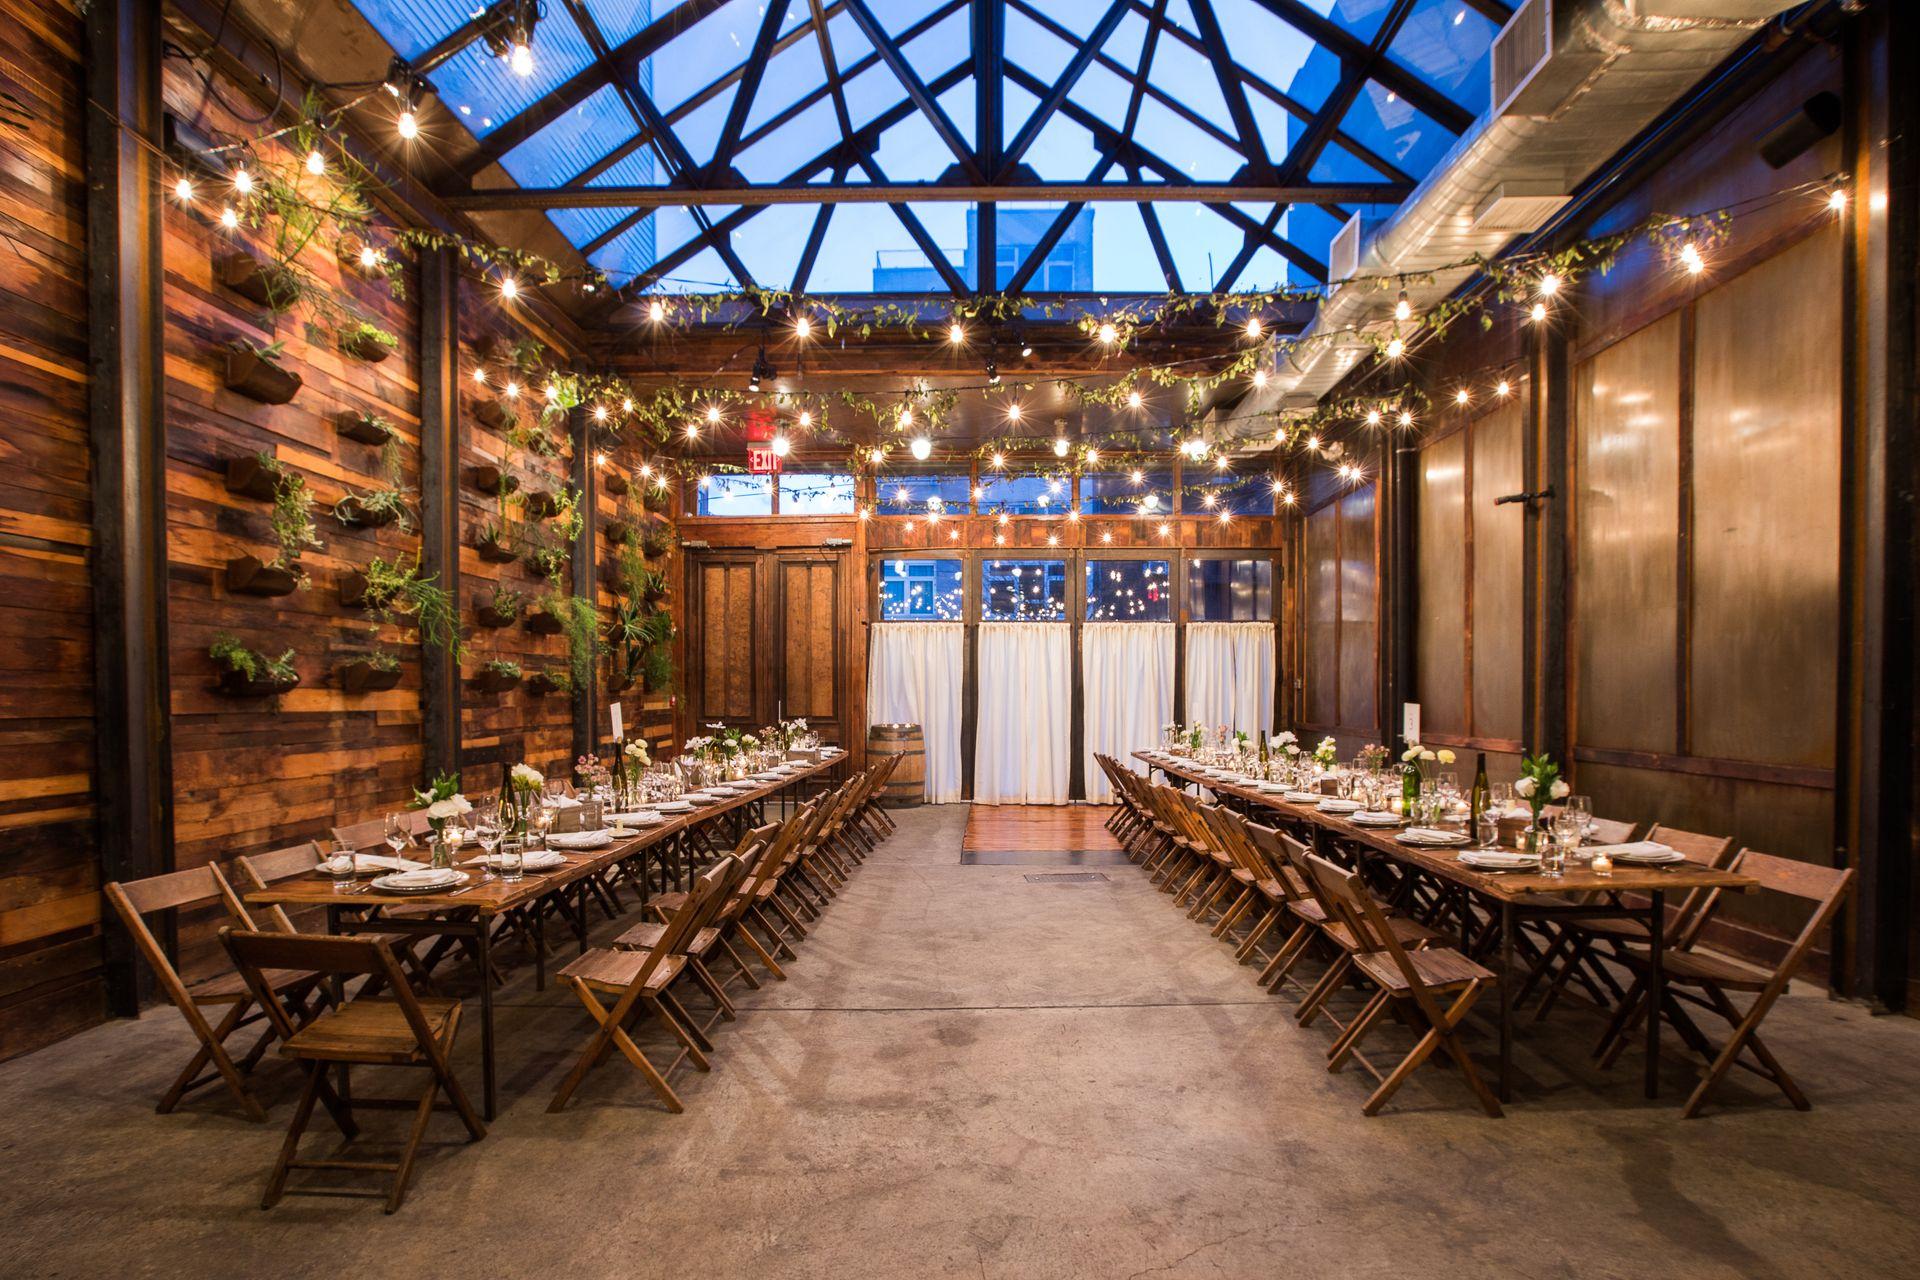 The Smarter Way to Wed New york wedding venues, Unique